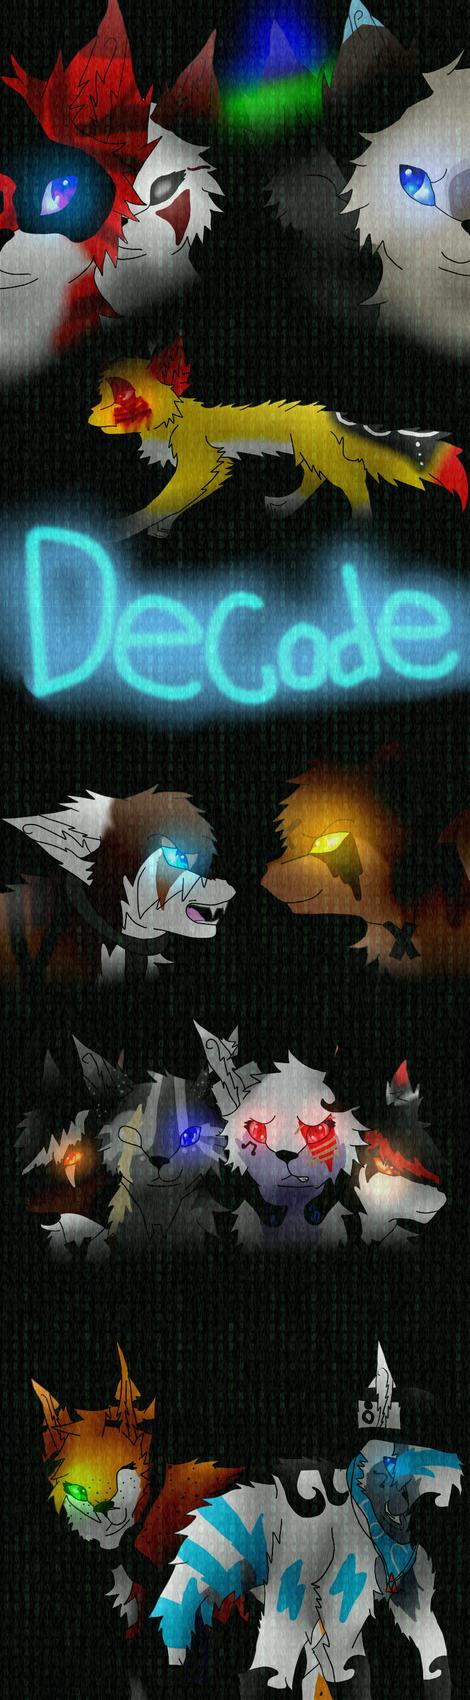 Decode Cover by Hawkspirit8228